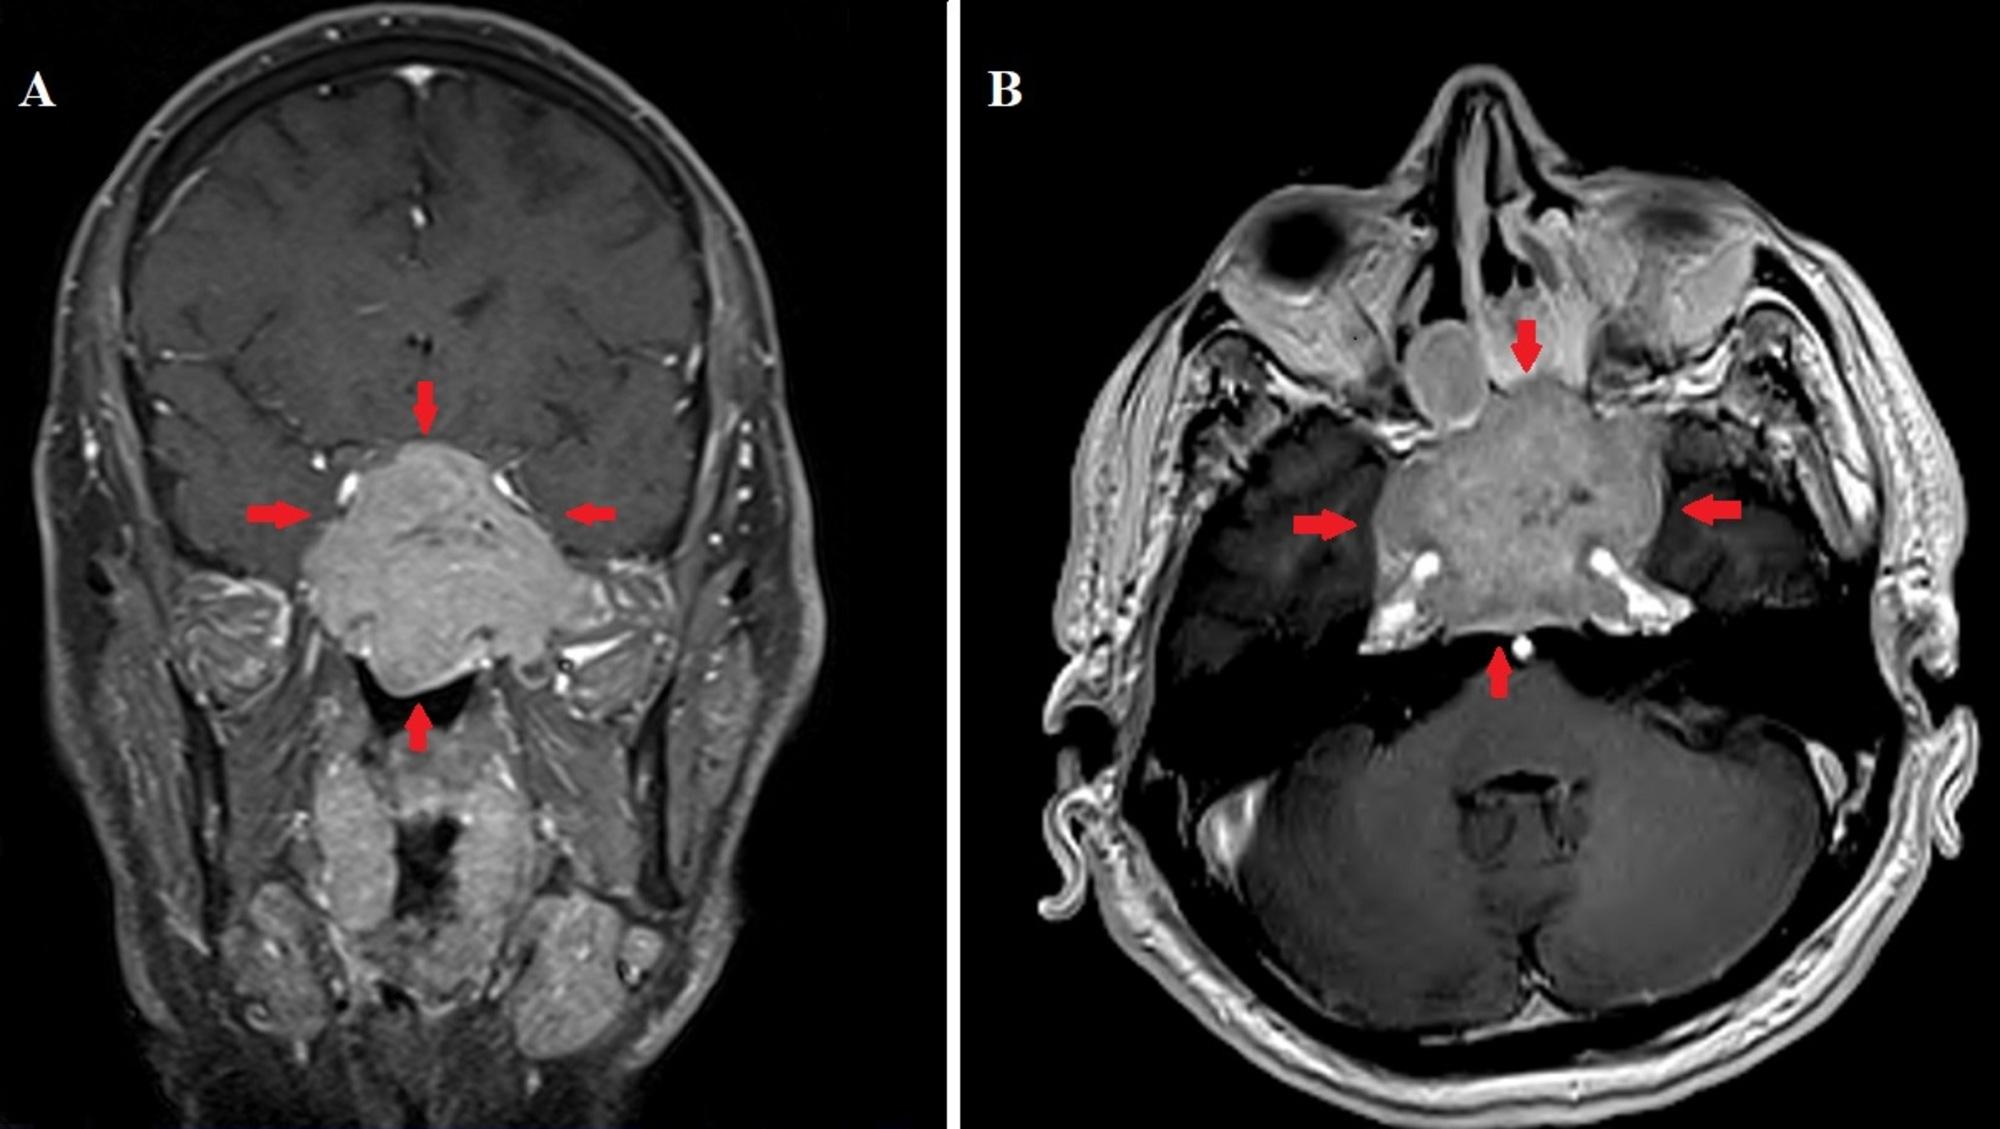 Neuroendocrine cancer with carcinoid tumors. METASTATIC CARCINOID TUMOR- ATYPICAL PRESENTATION